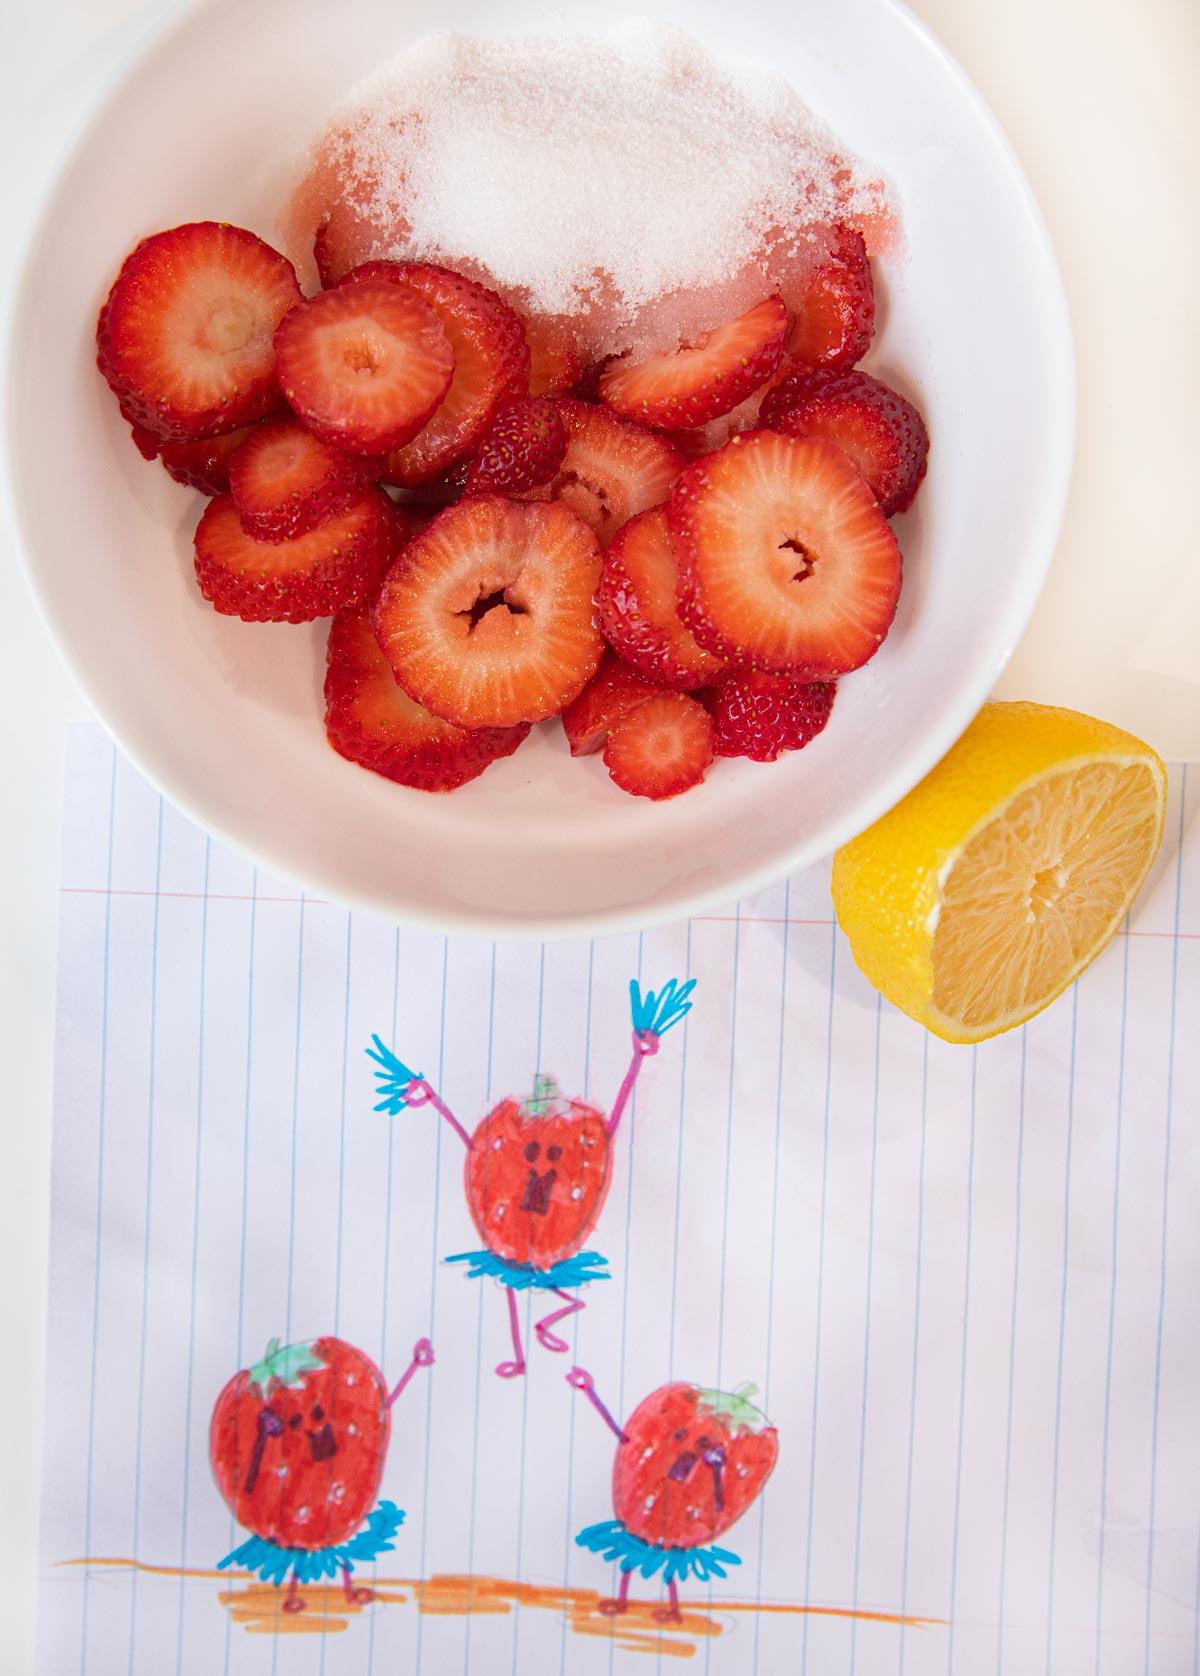 Microwave Strawberry Jam ingredients in bowl